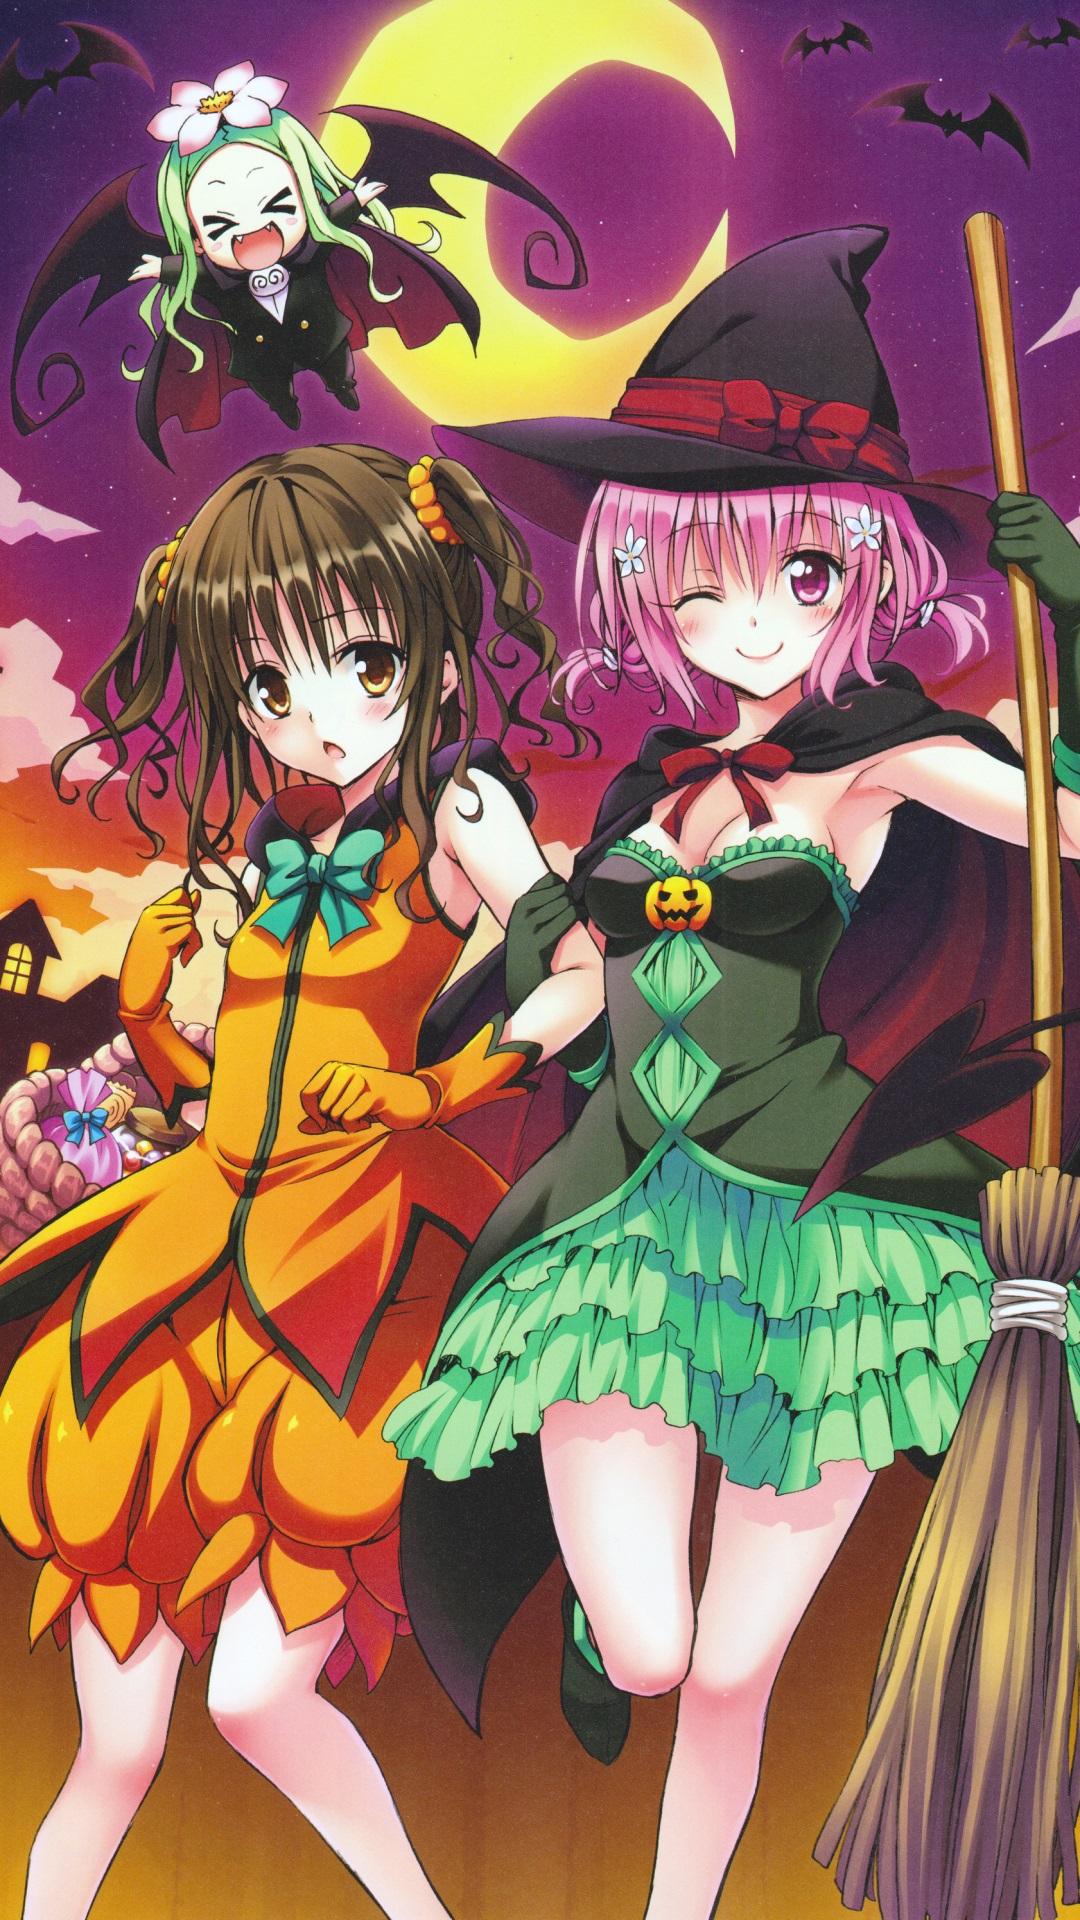 Anime Halloween 2013 Sony Xperia Z Wallpaper 1080 1920 3